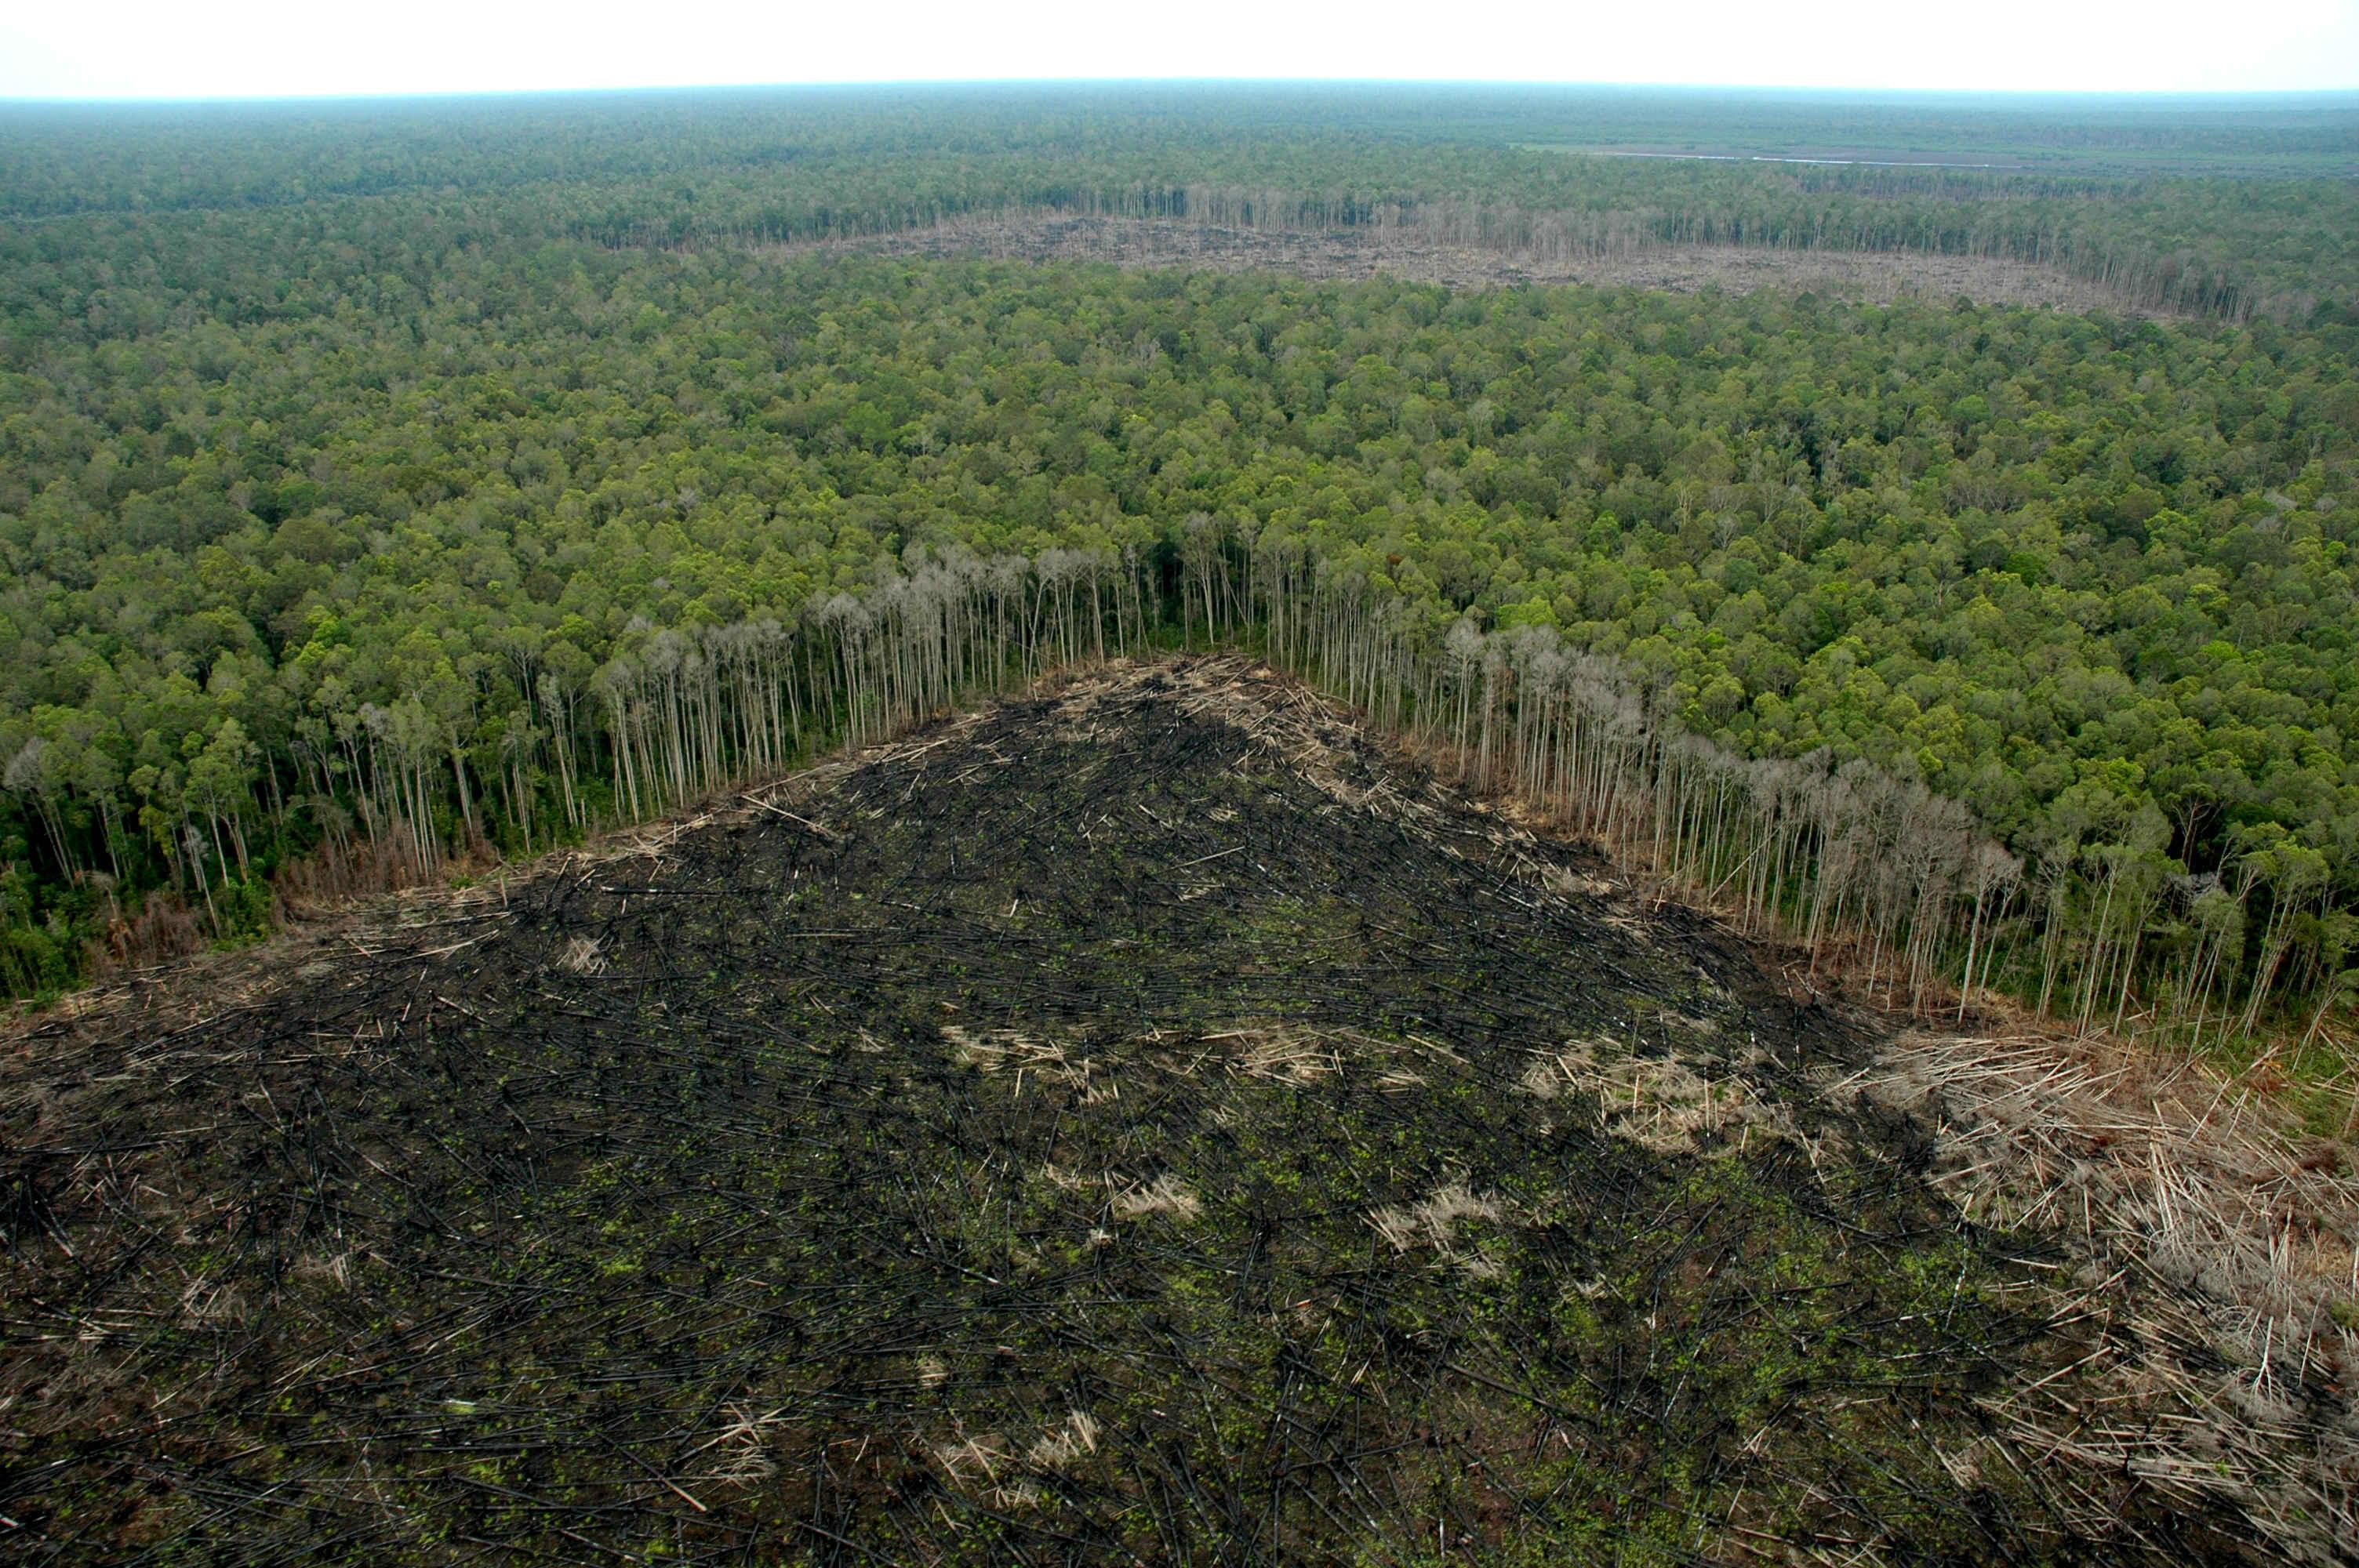 No m s selvas arrasadas en indonesia para fabricar papel higi nico para eeuu materia - Mas goy fornells de la selva ...